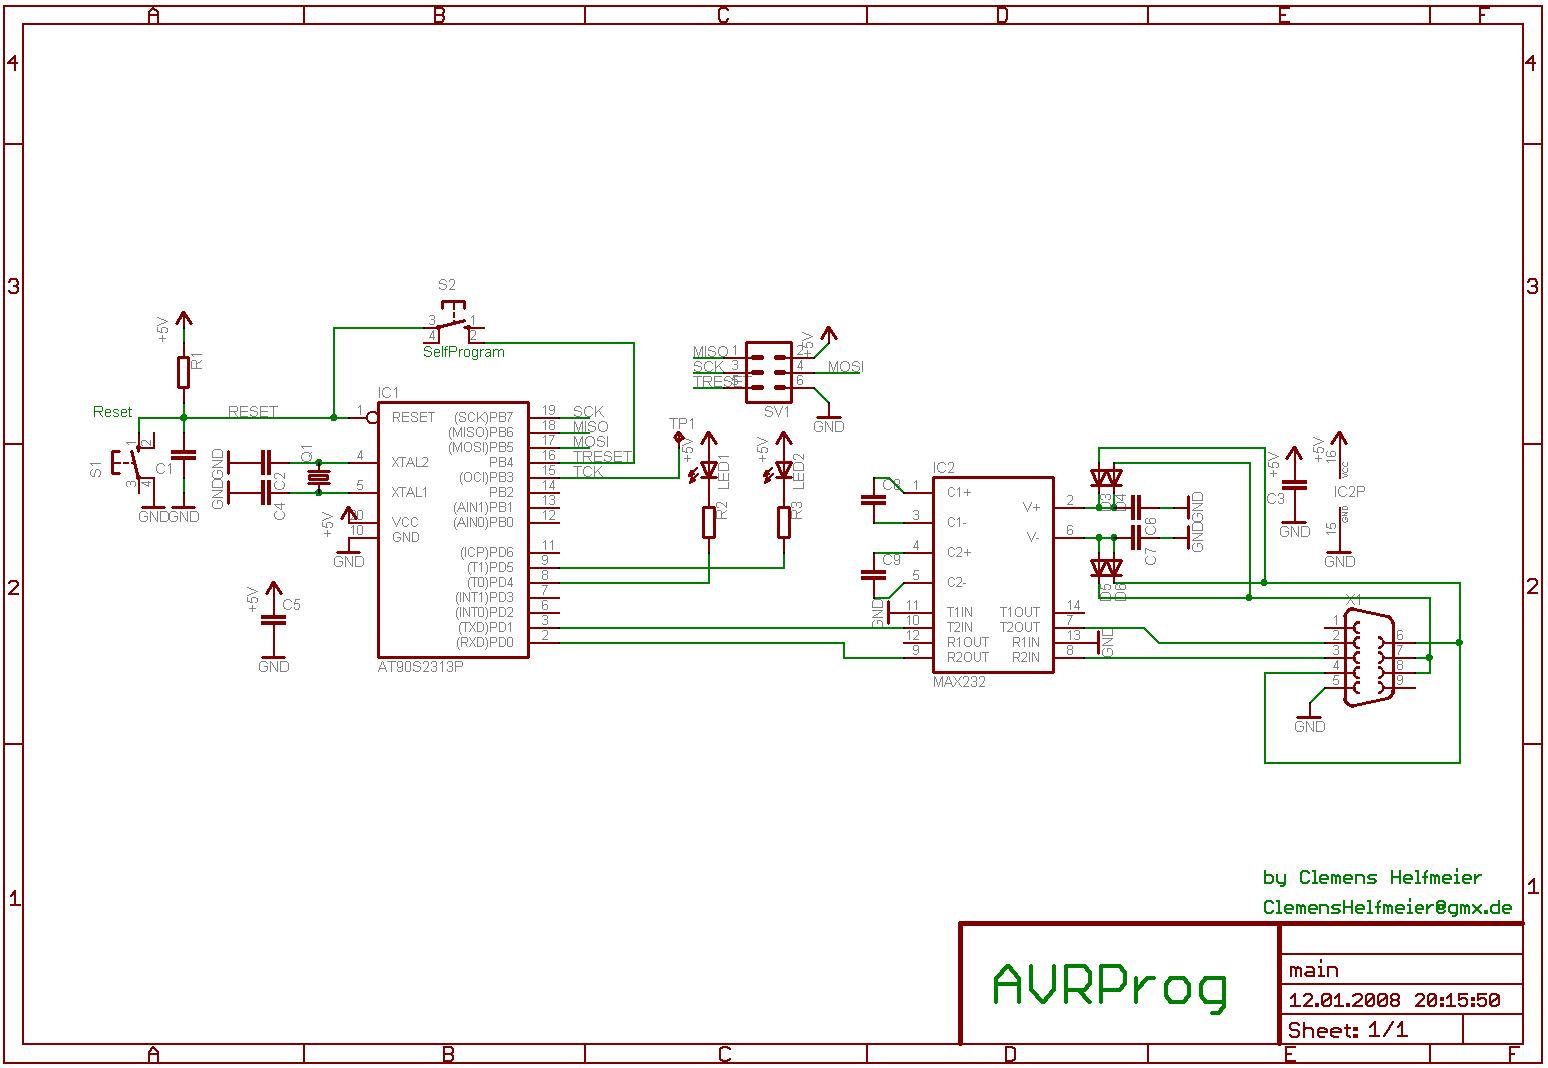 Berühmt Verdrahtungslayout Software Bilder - Elektrische Schaltplan ...